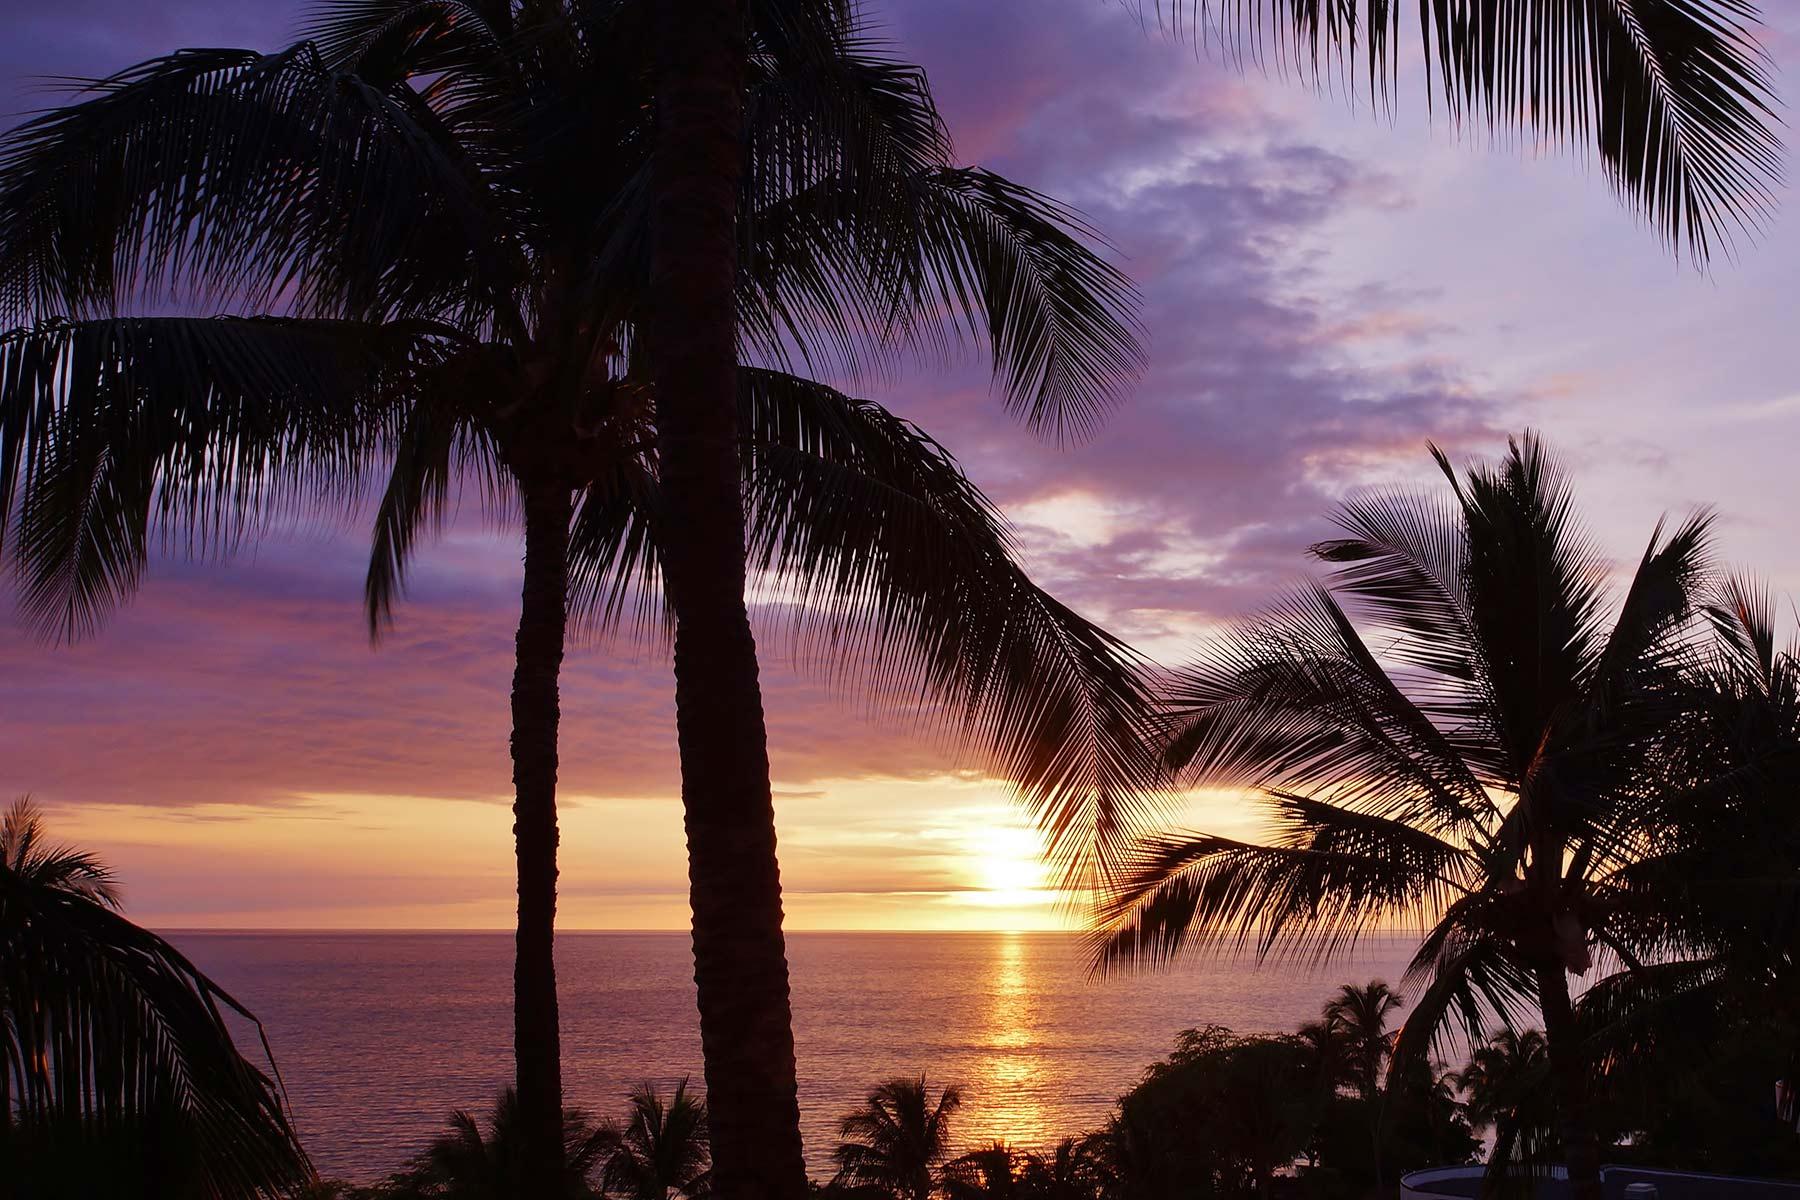 CROCIERA ALLE HAWAII: 5 motivi per scegliere le Hawaii!